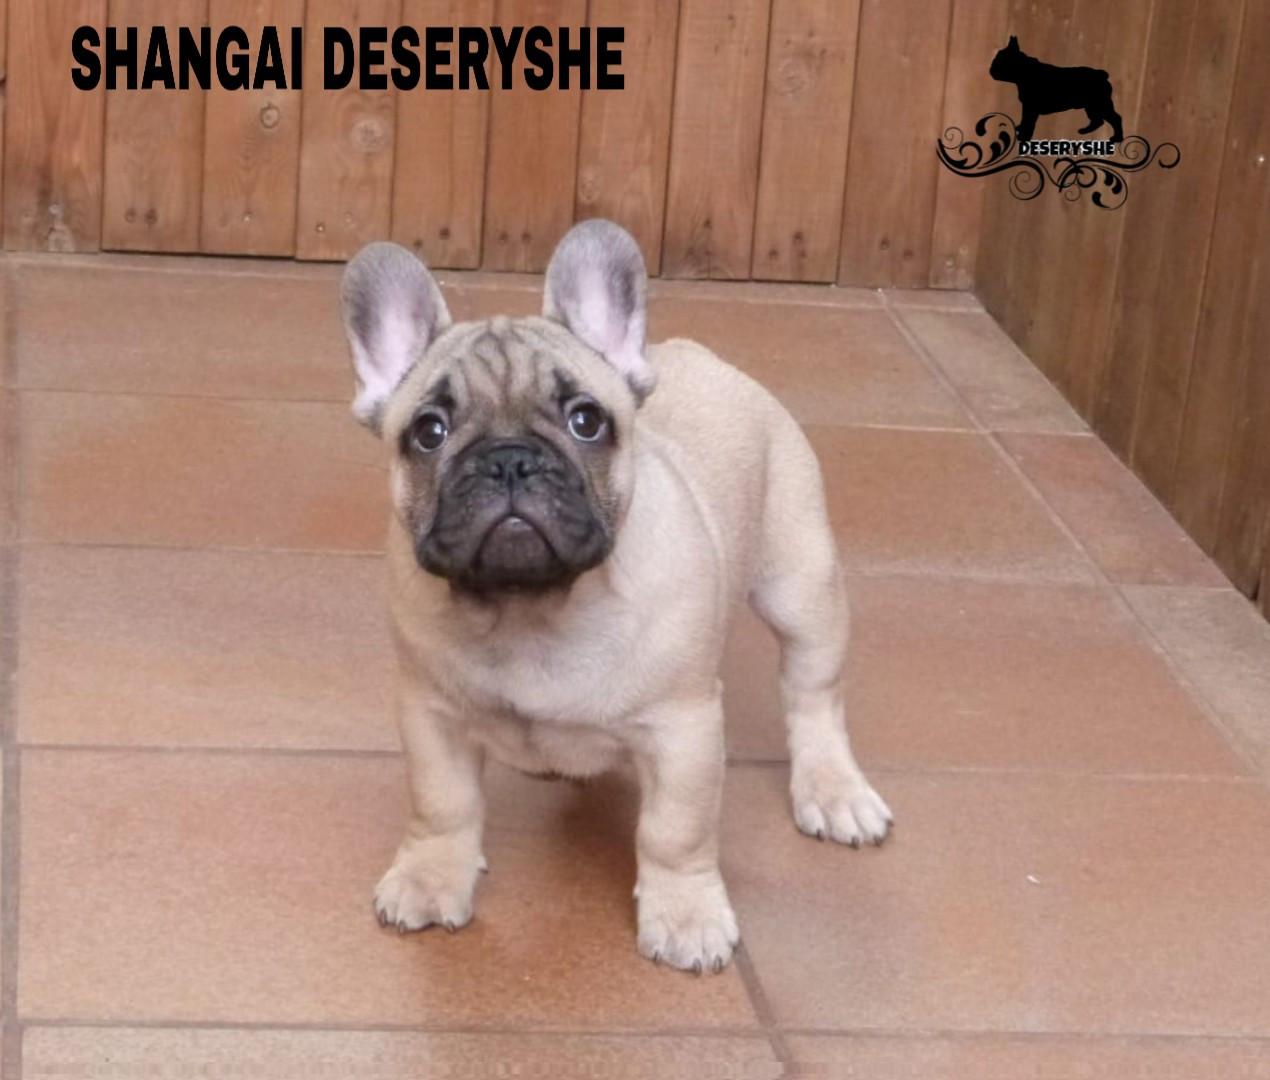 SHANGAI DESERYSHE PUPPY